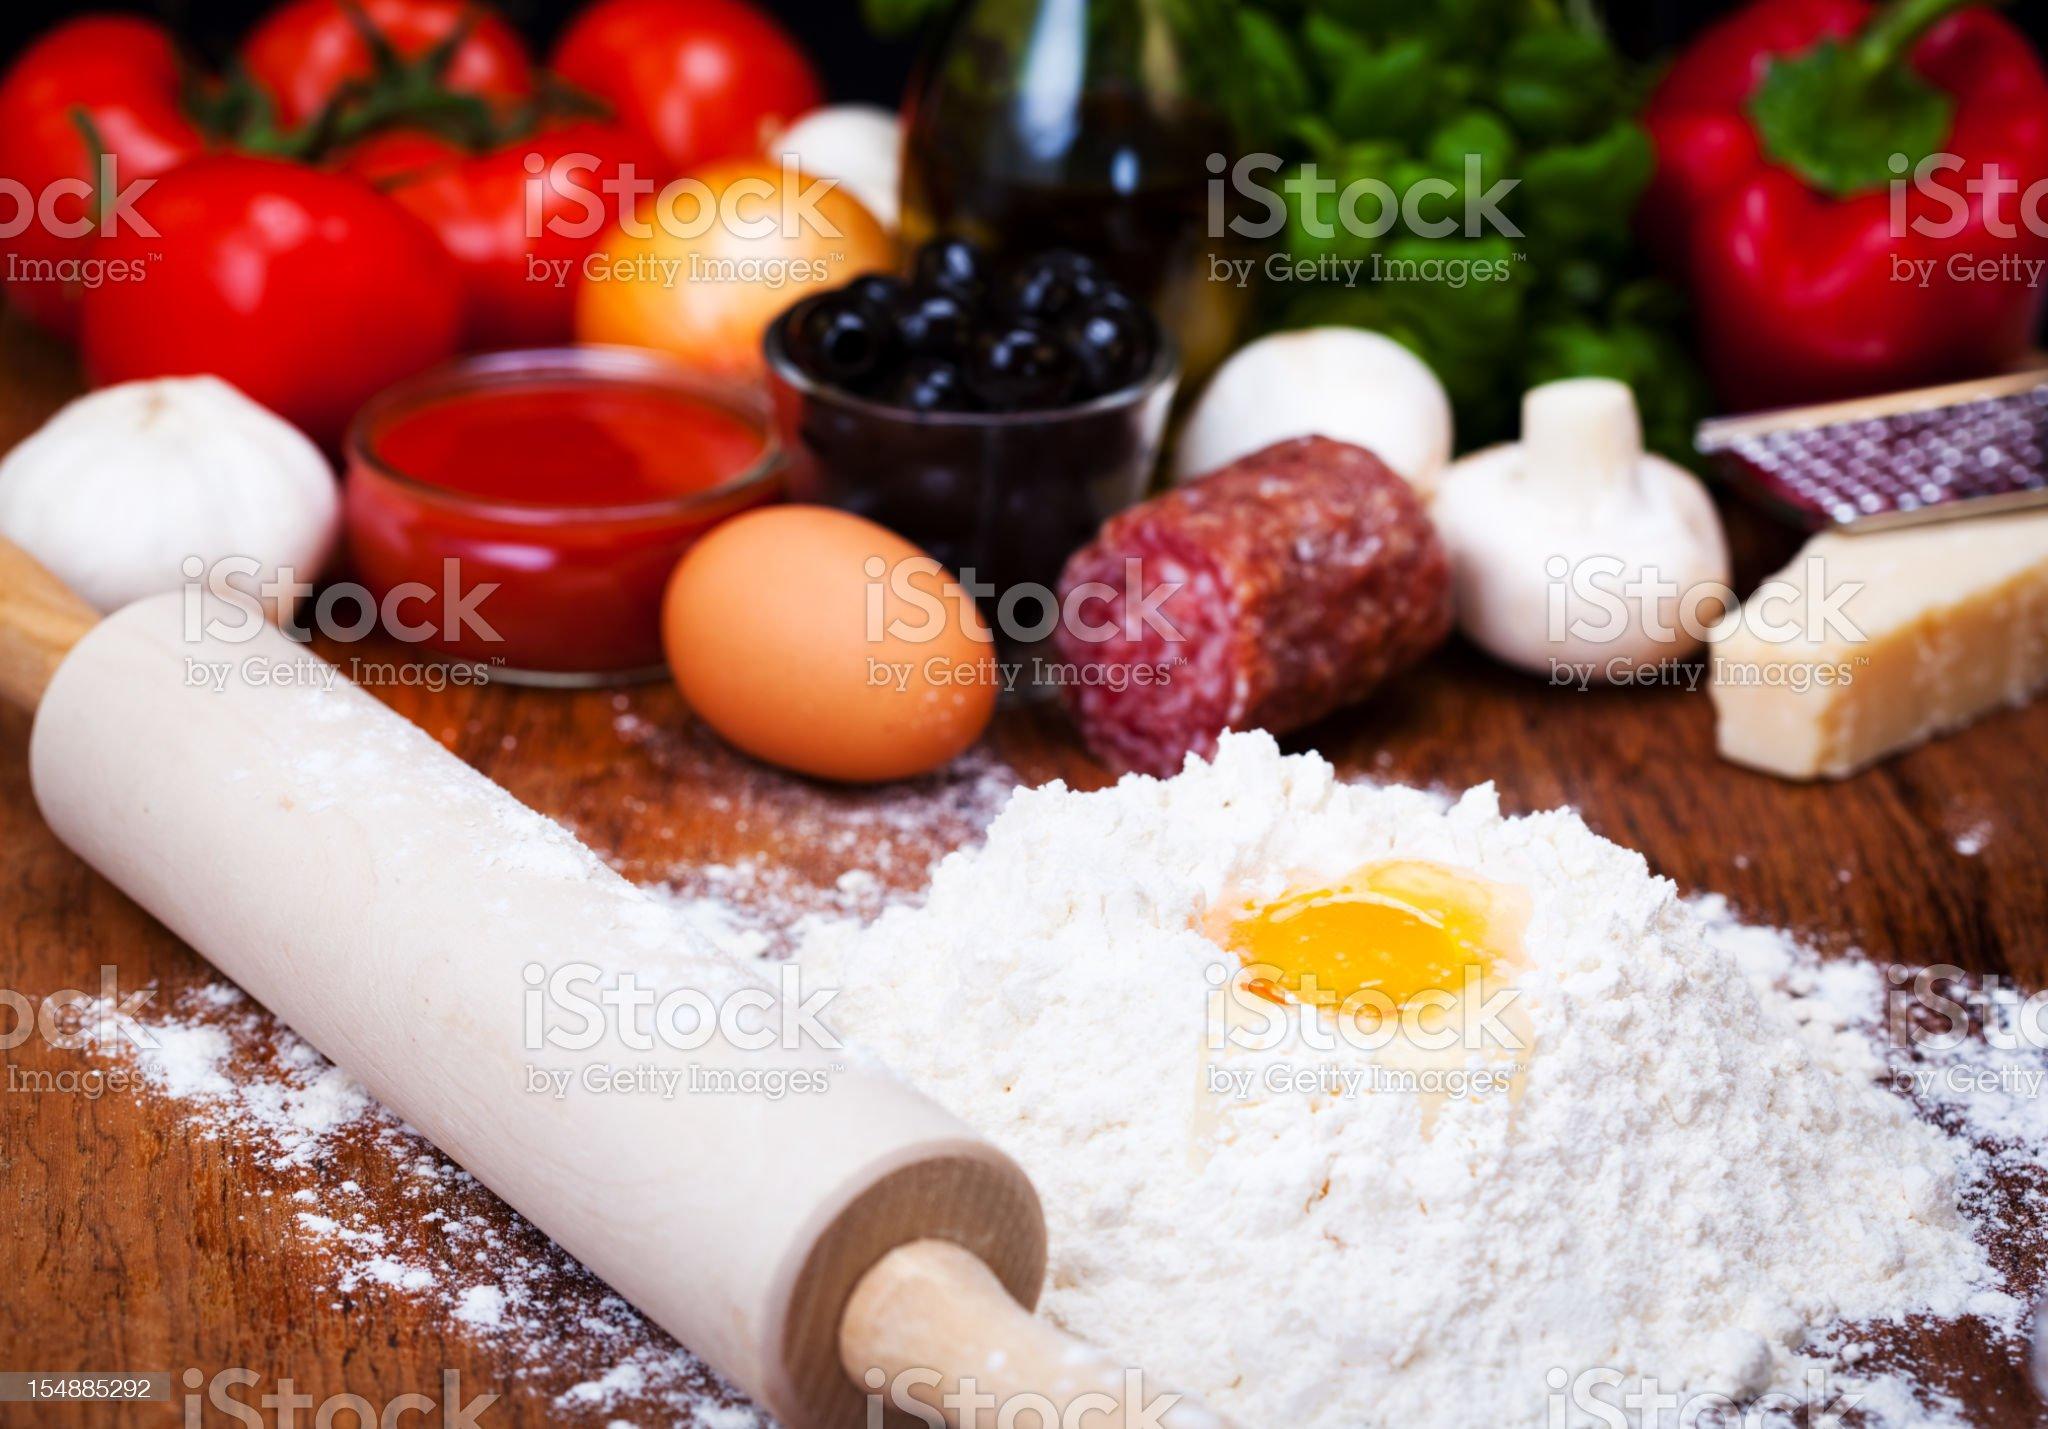 Ingredients royalty-free stock photo